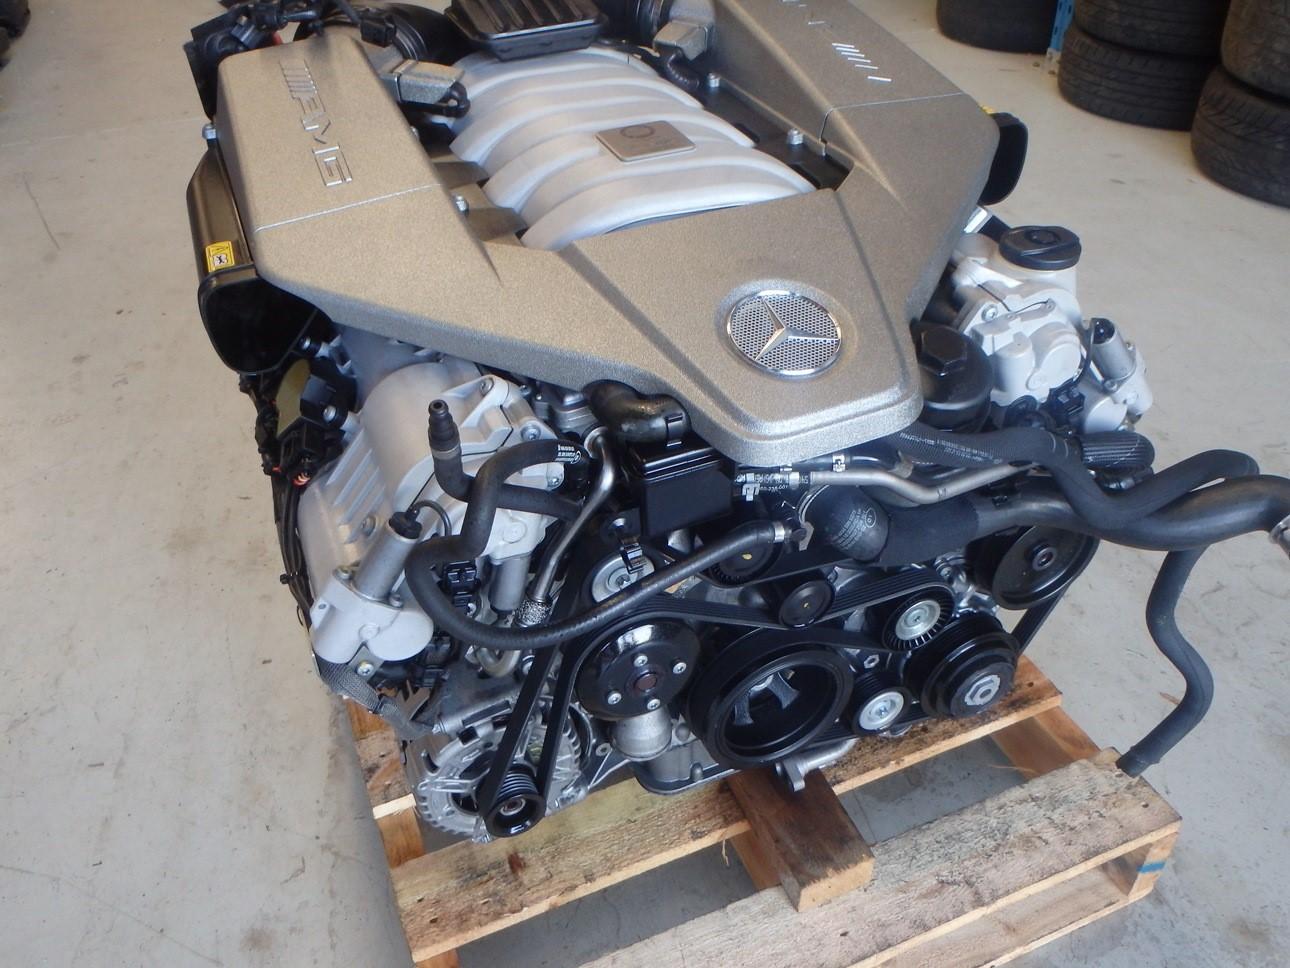 Mercedes benz c63 amg 2008 w204 6 2l m156 v8 complete for Mercedes benz engines for sale